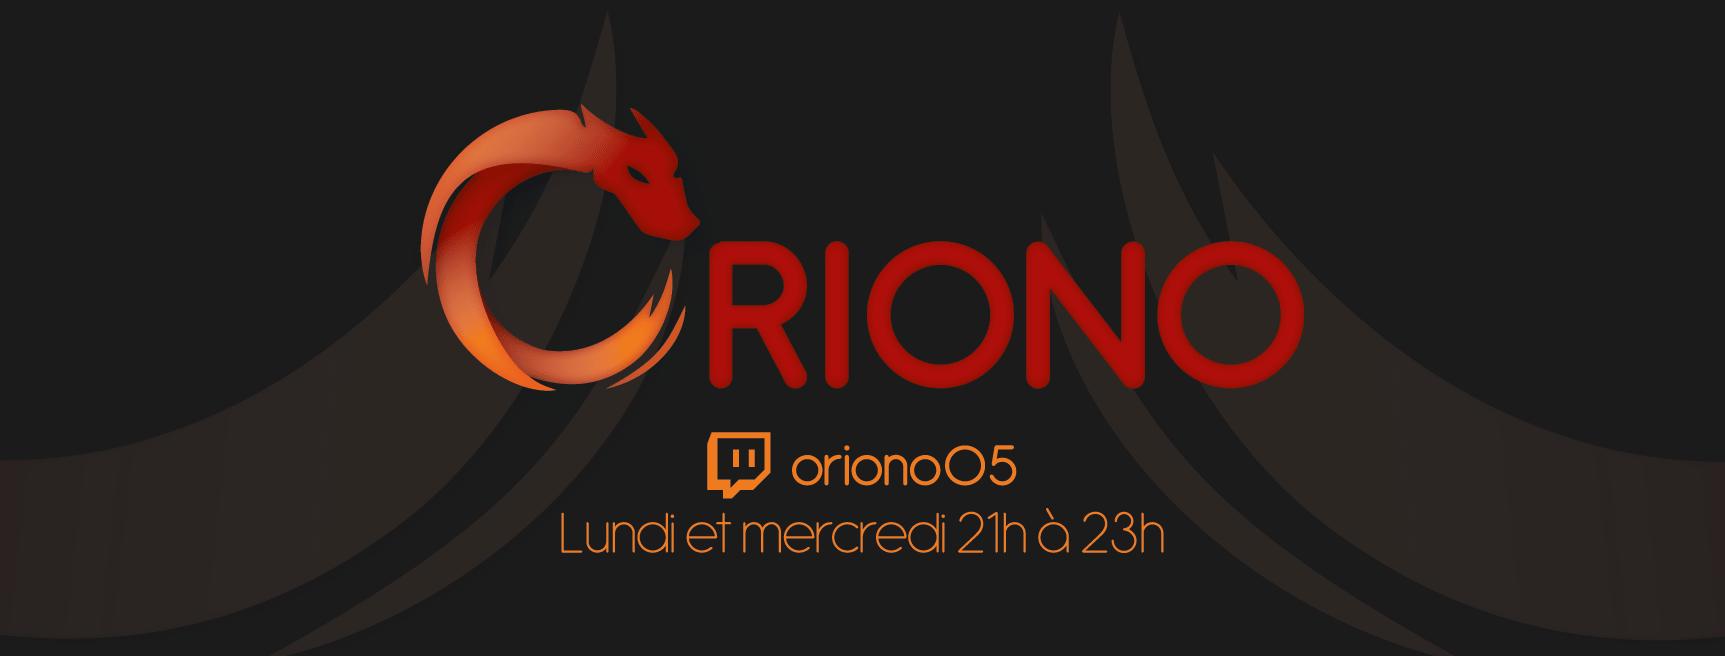 Photo de couverture Oriono